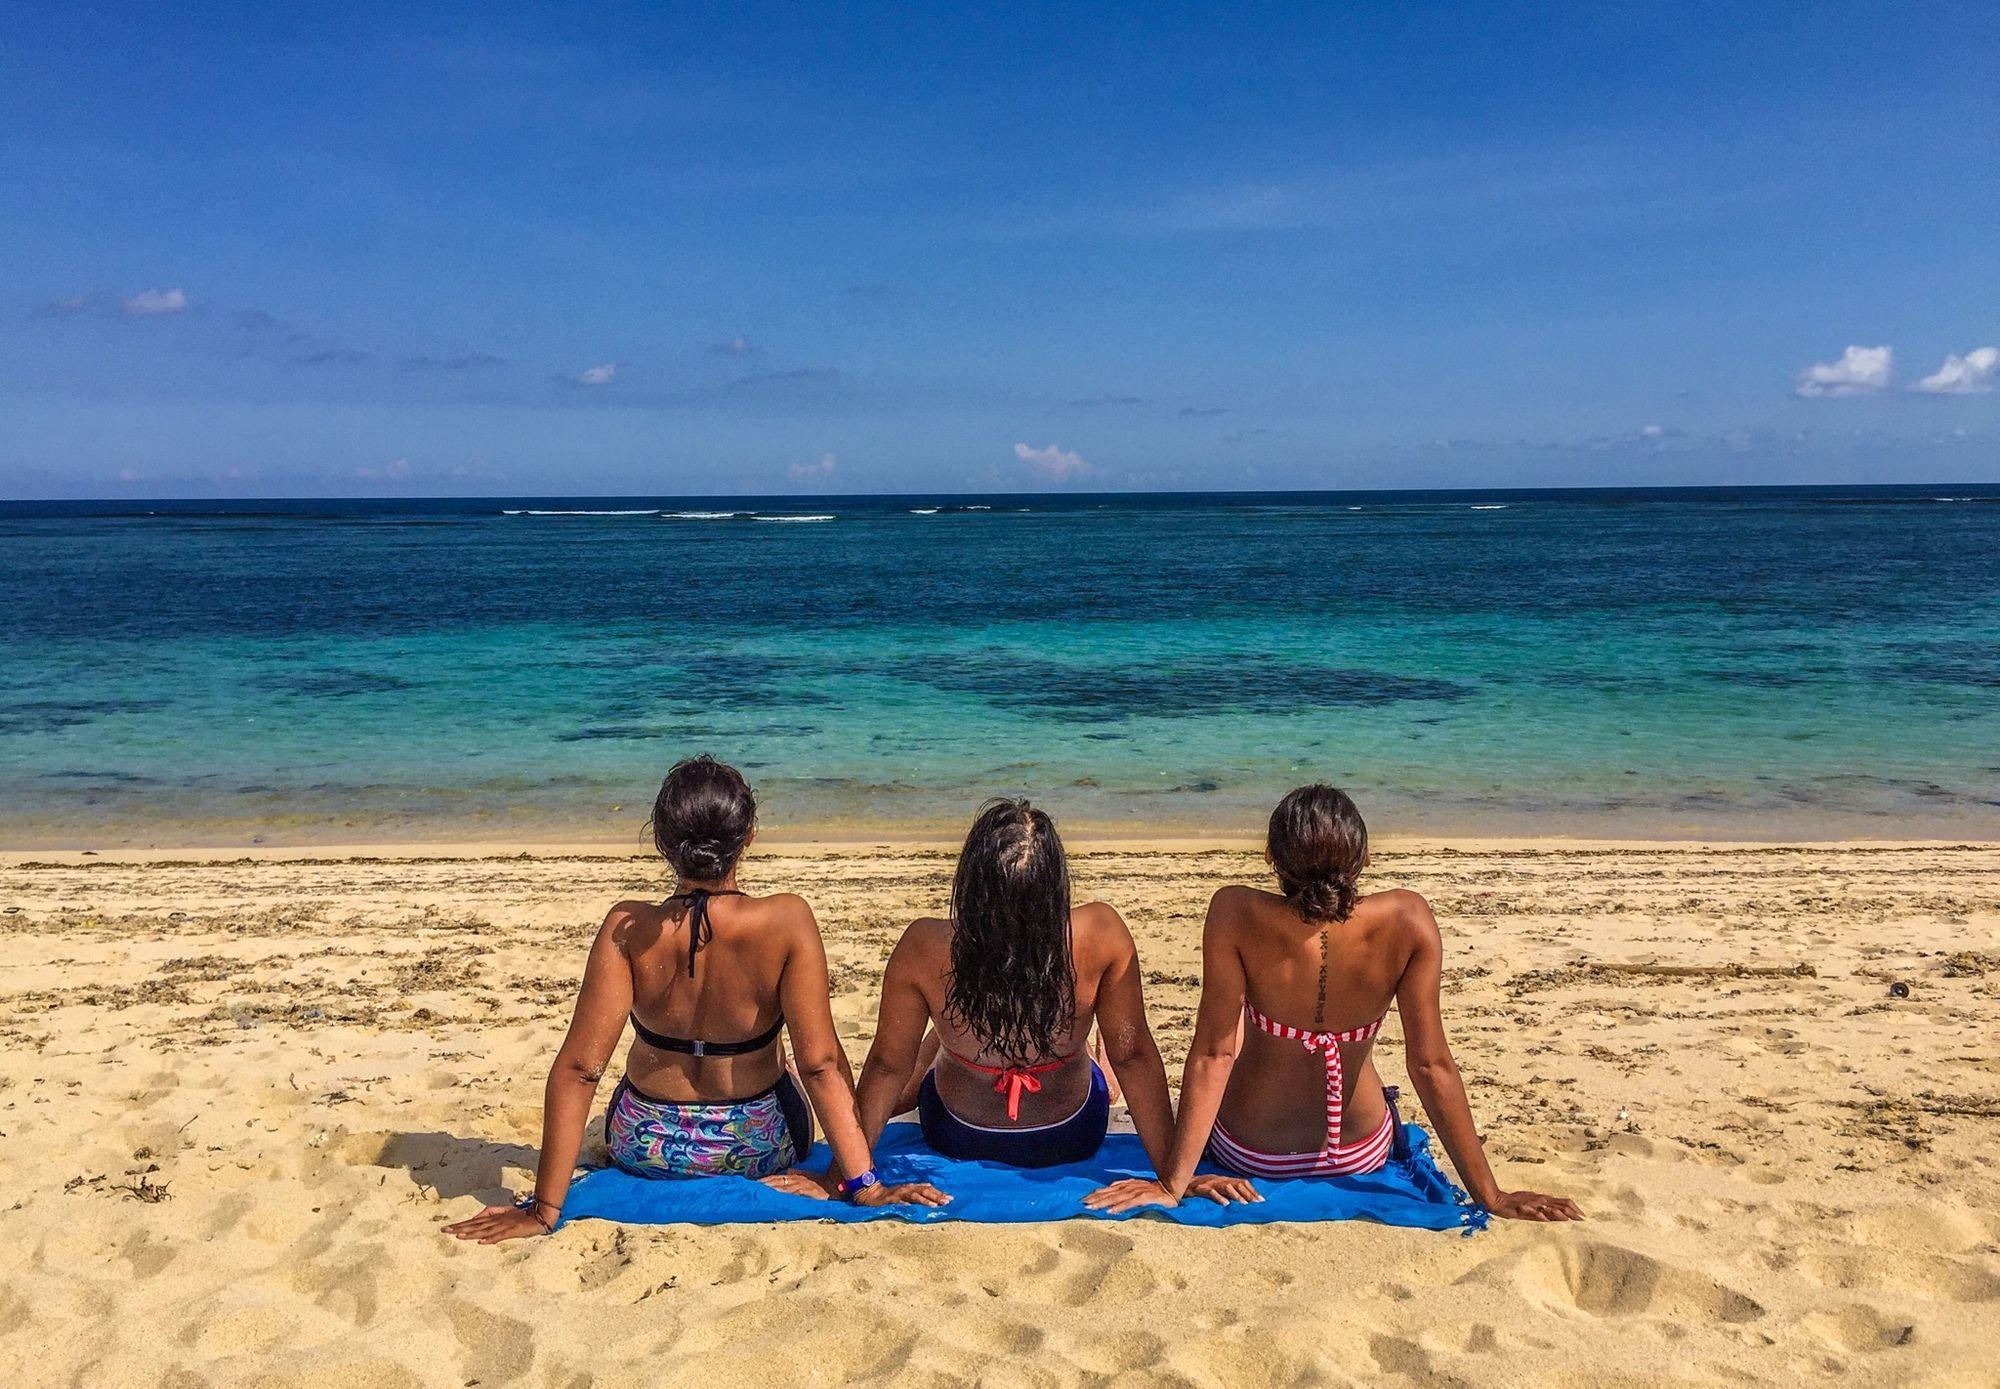 Beachaddict Cloudandsky Whitesand Friendship Happysunday Bikinis